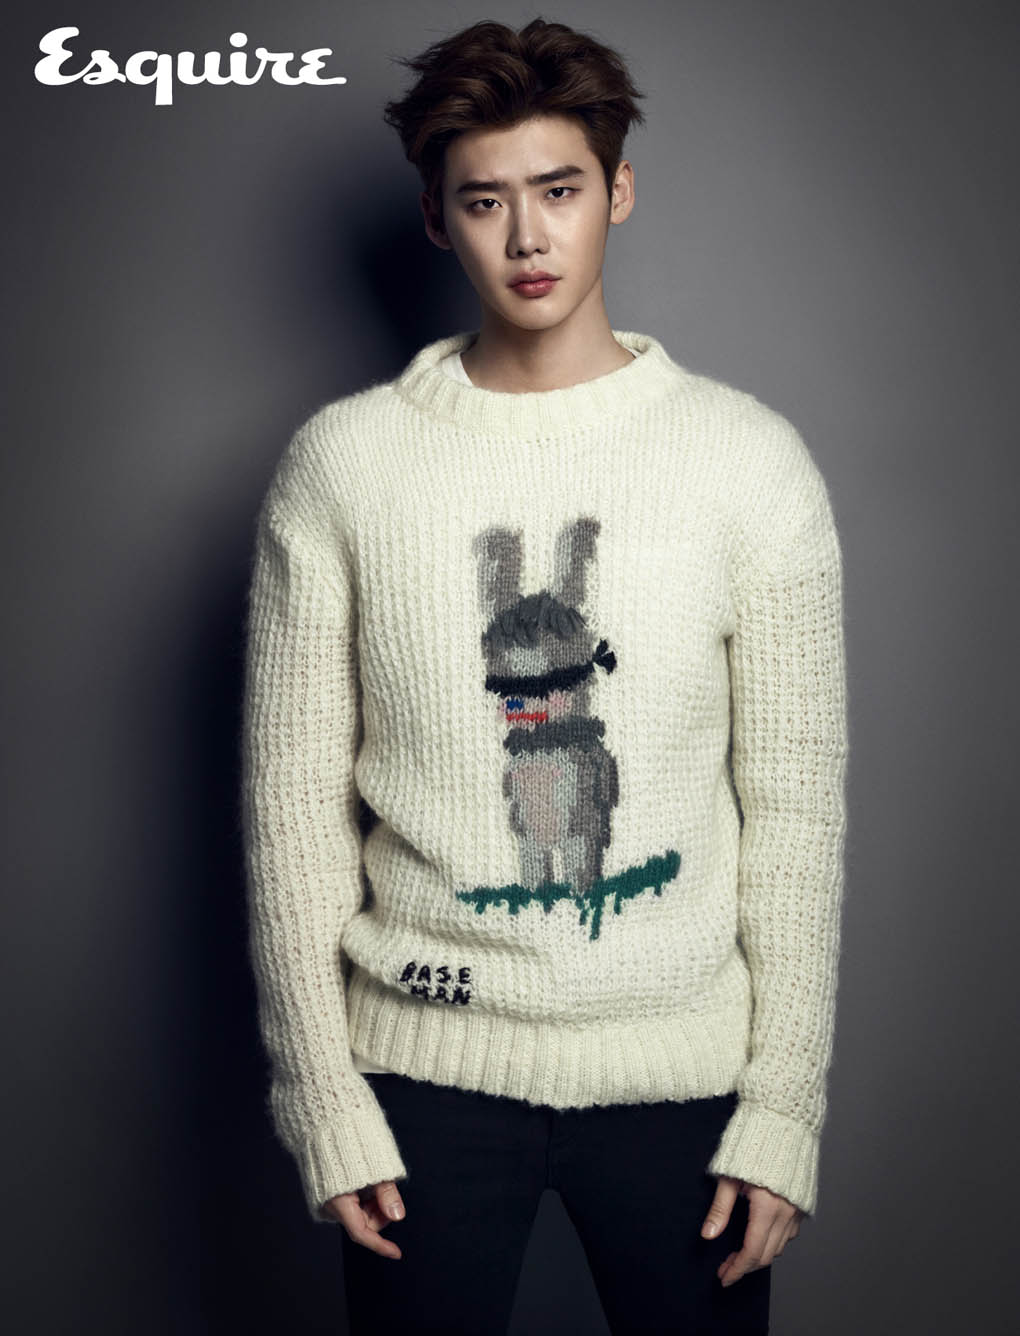 Lee_Jong_Suk_sweater